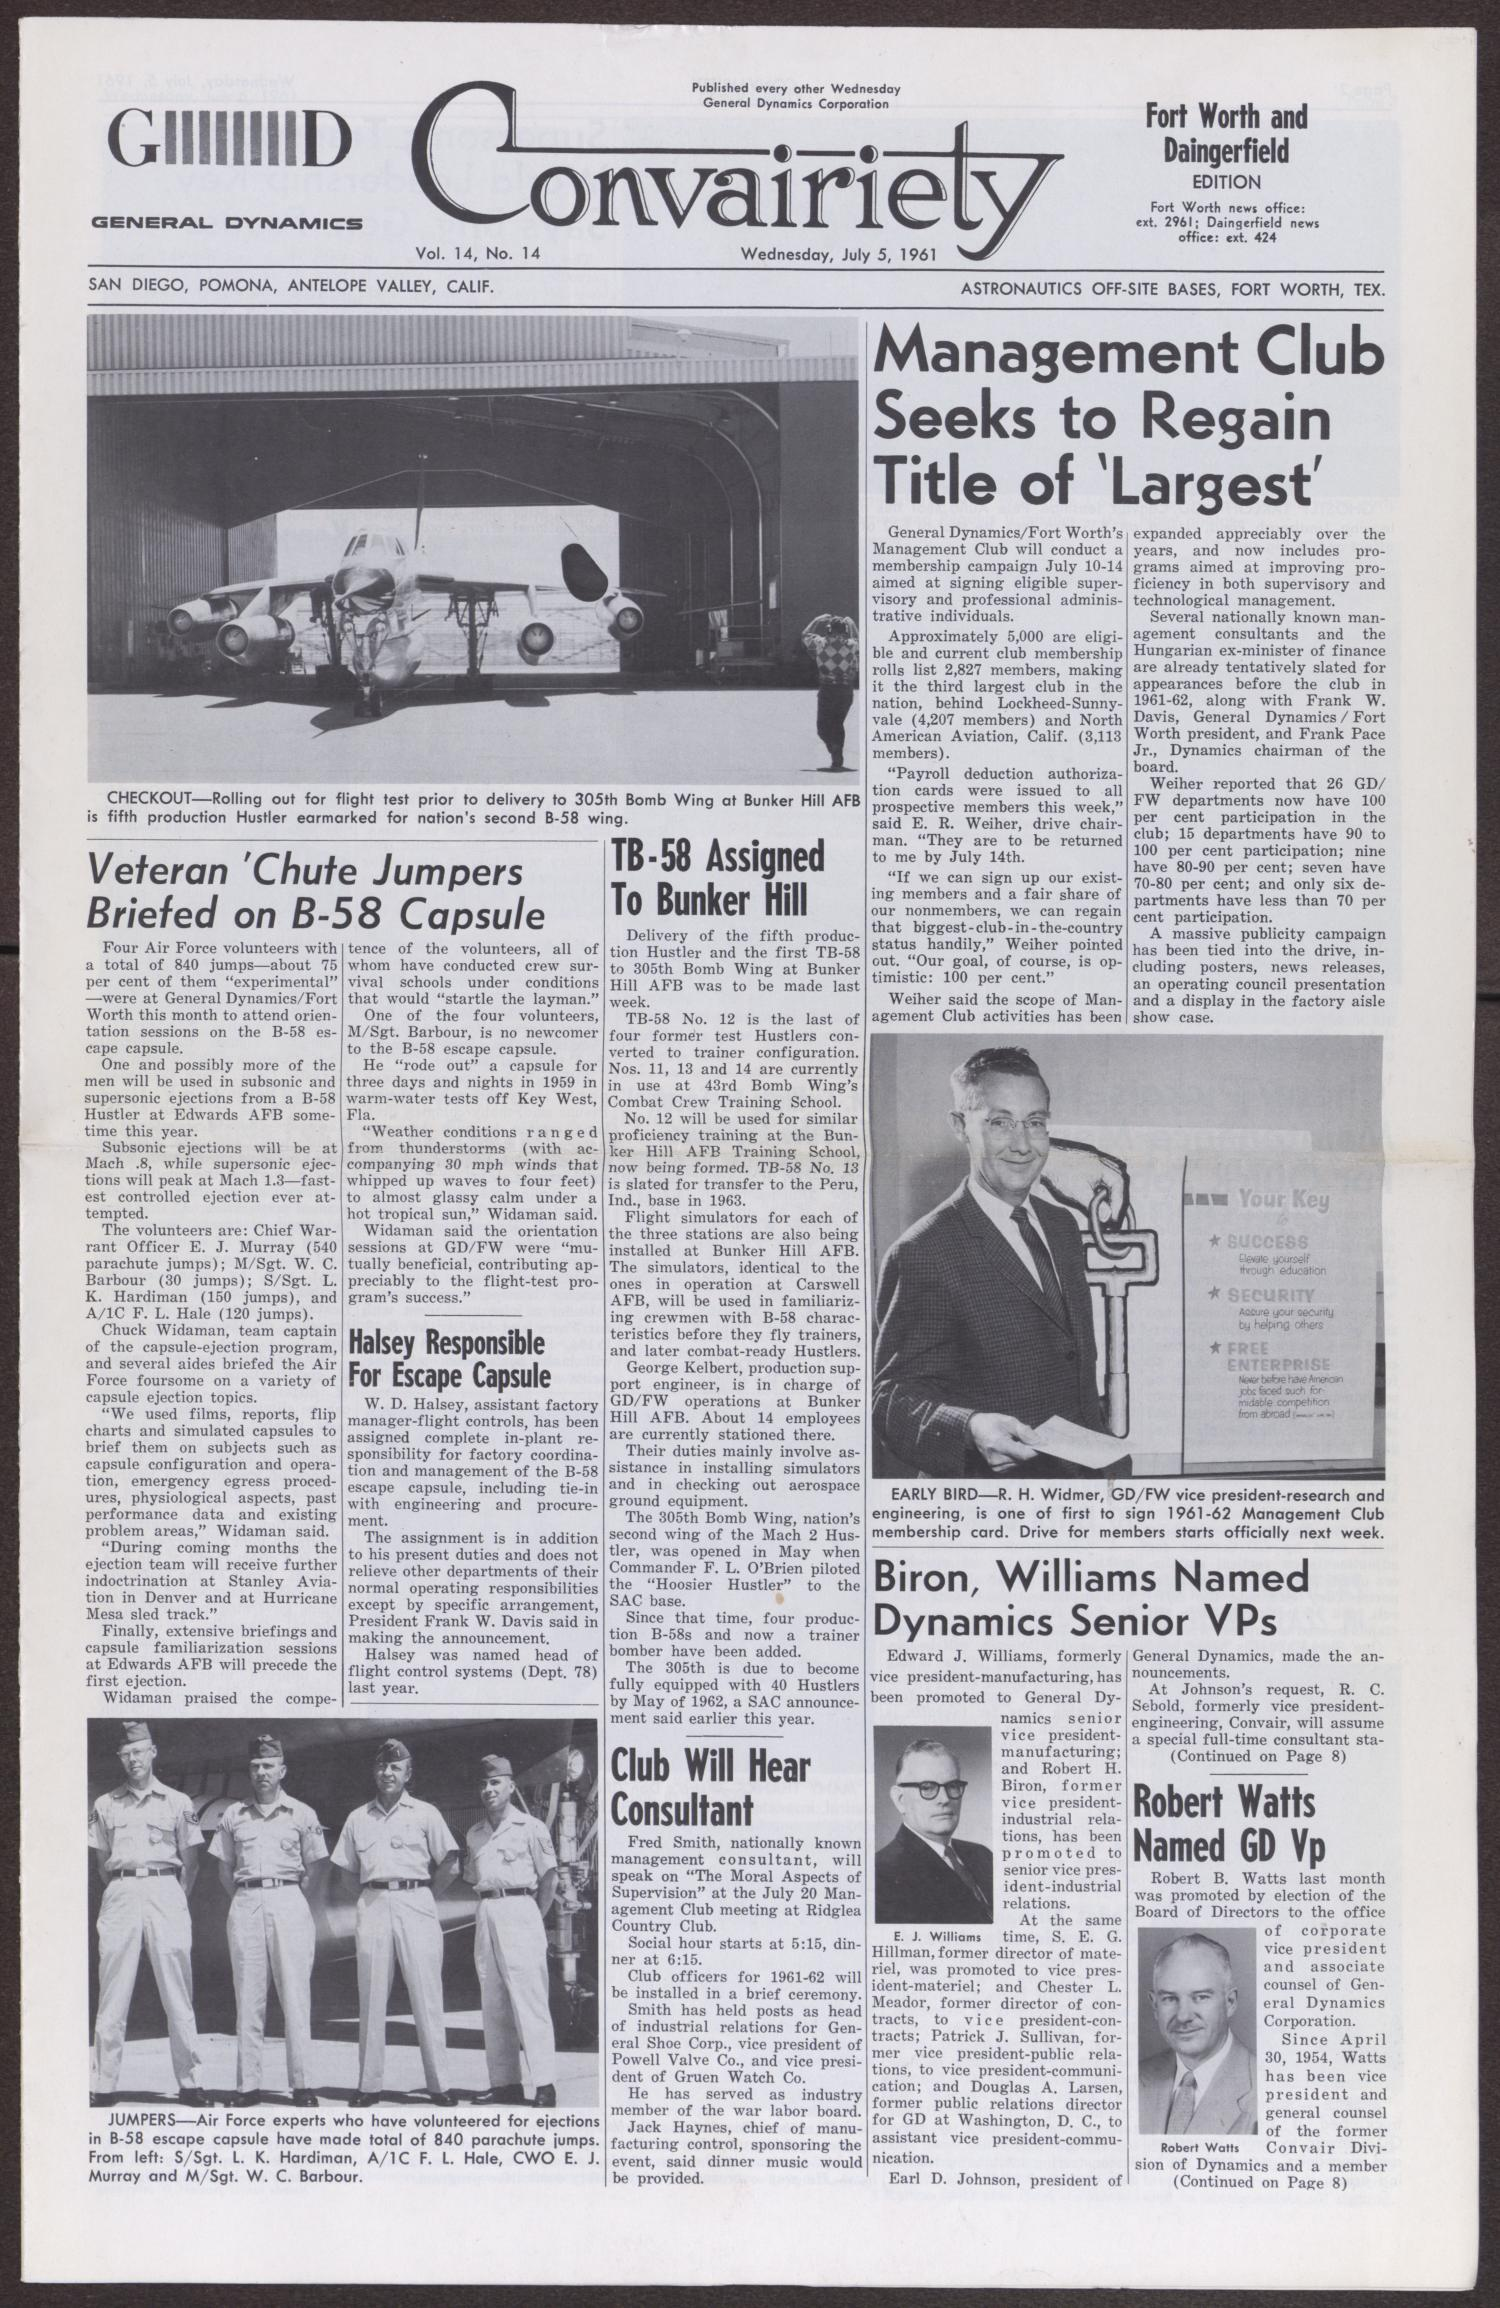 Convairiety, Volume 14, Number 14, Wednesday, July 5, 1961